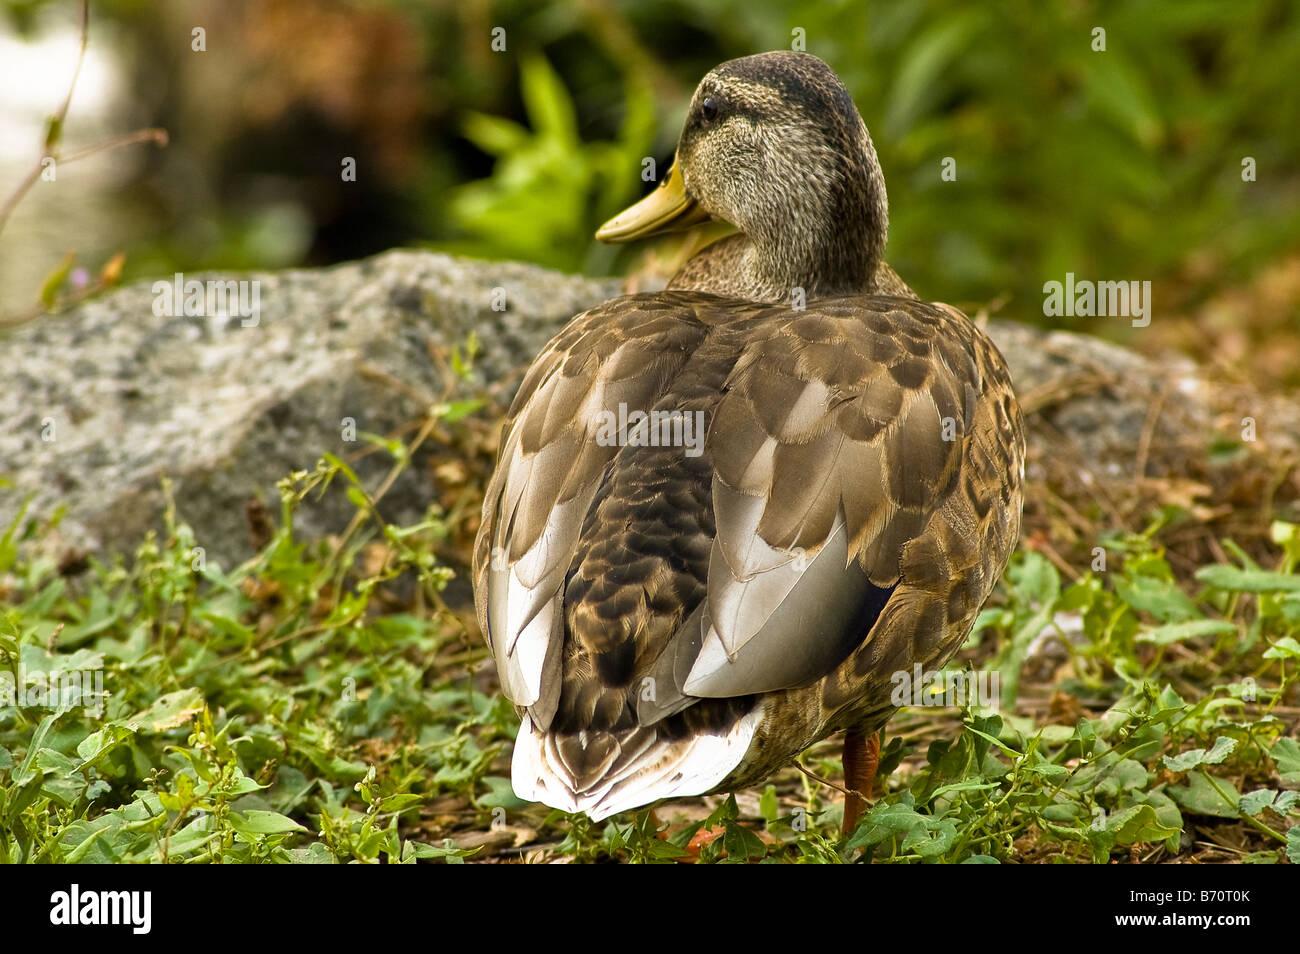 Mallard Duck at Gairloch Gardens - Stock Image